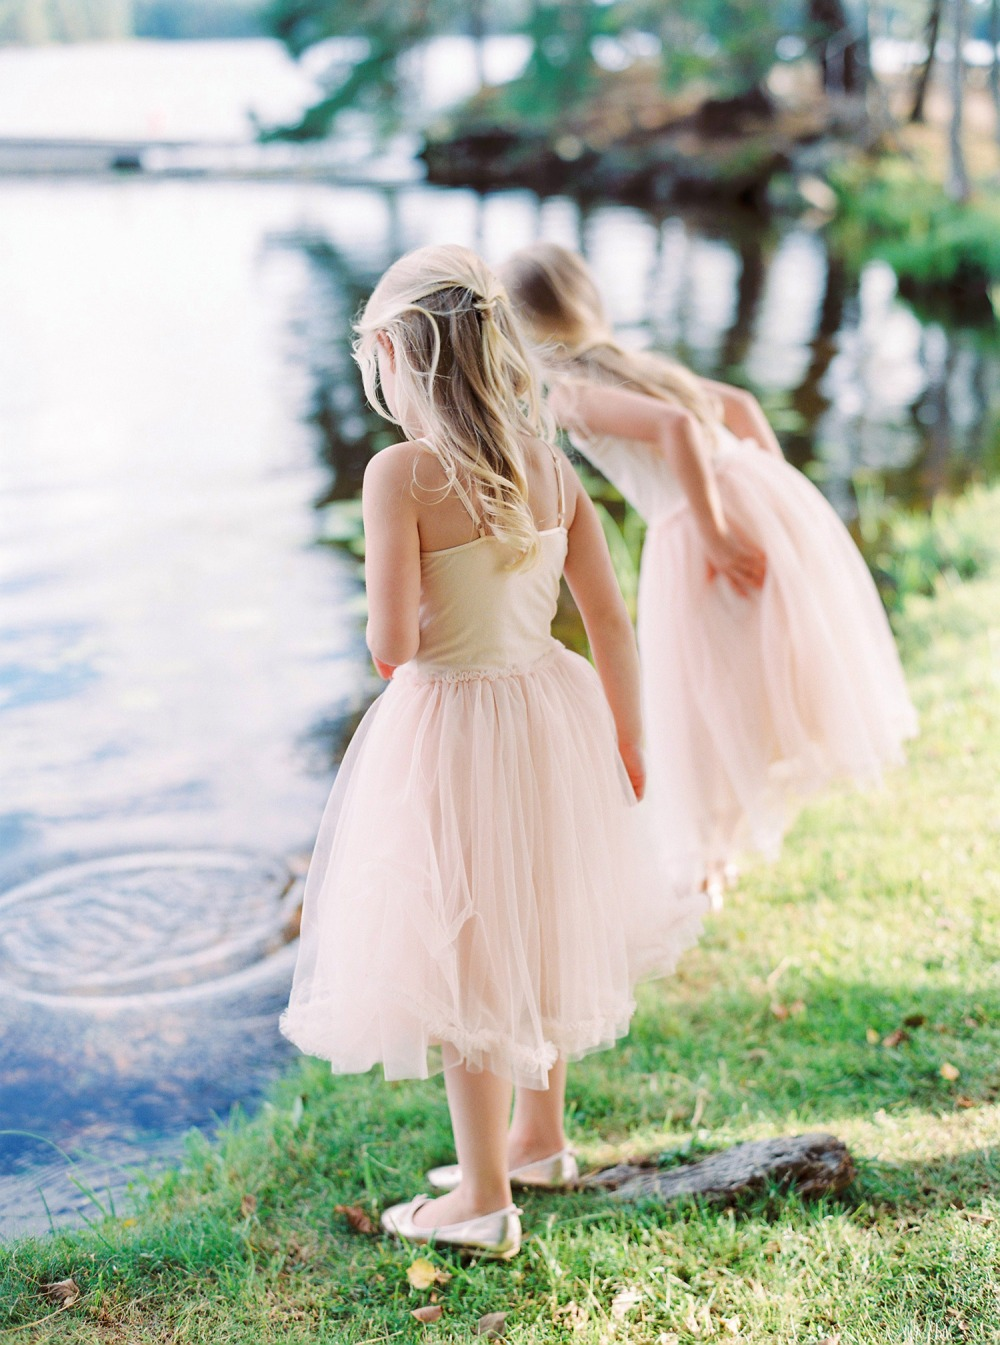 web-2bridesphotography_isabelle_weddings_038